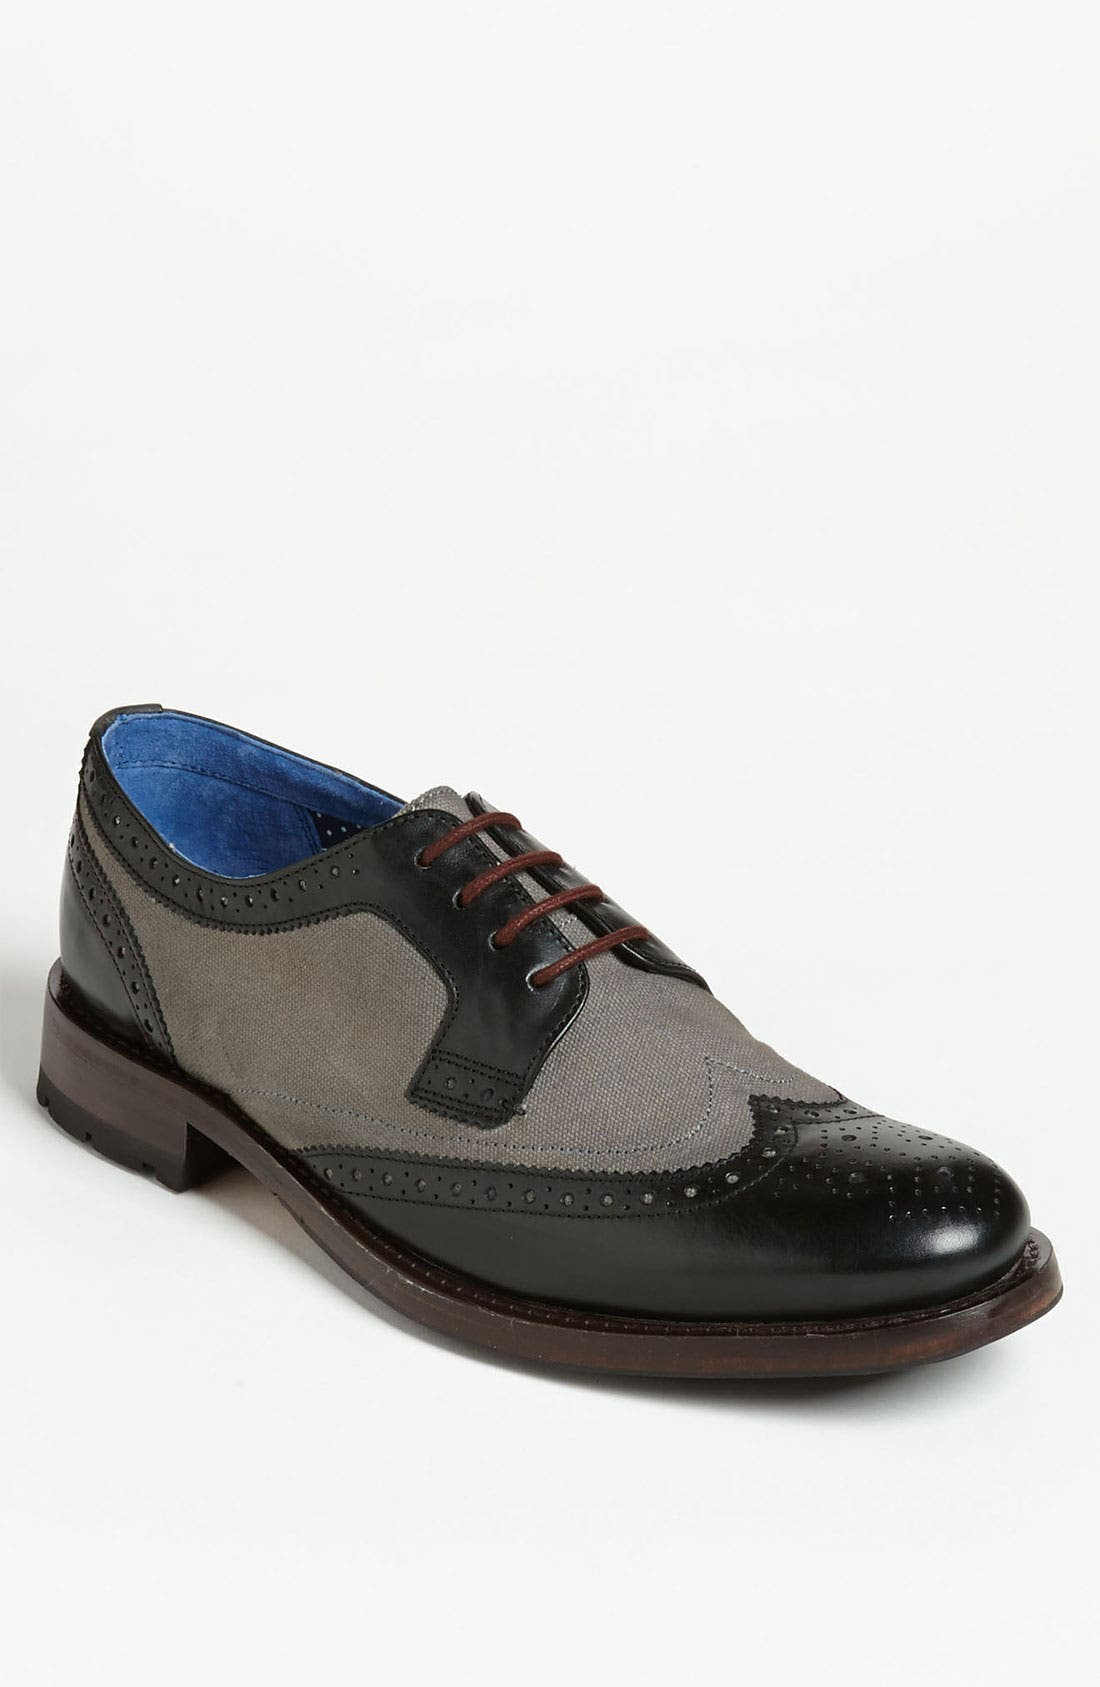 Alternate Image 1 Selected - Ted Baker London 'Cassiuss' Spectator Shoe